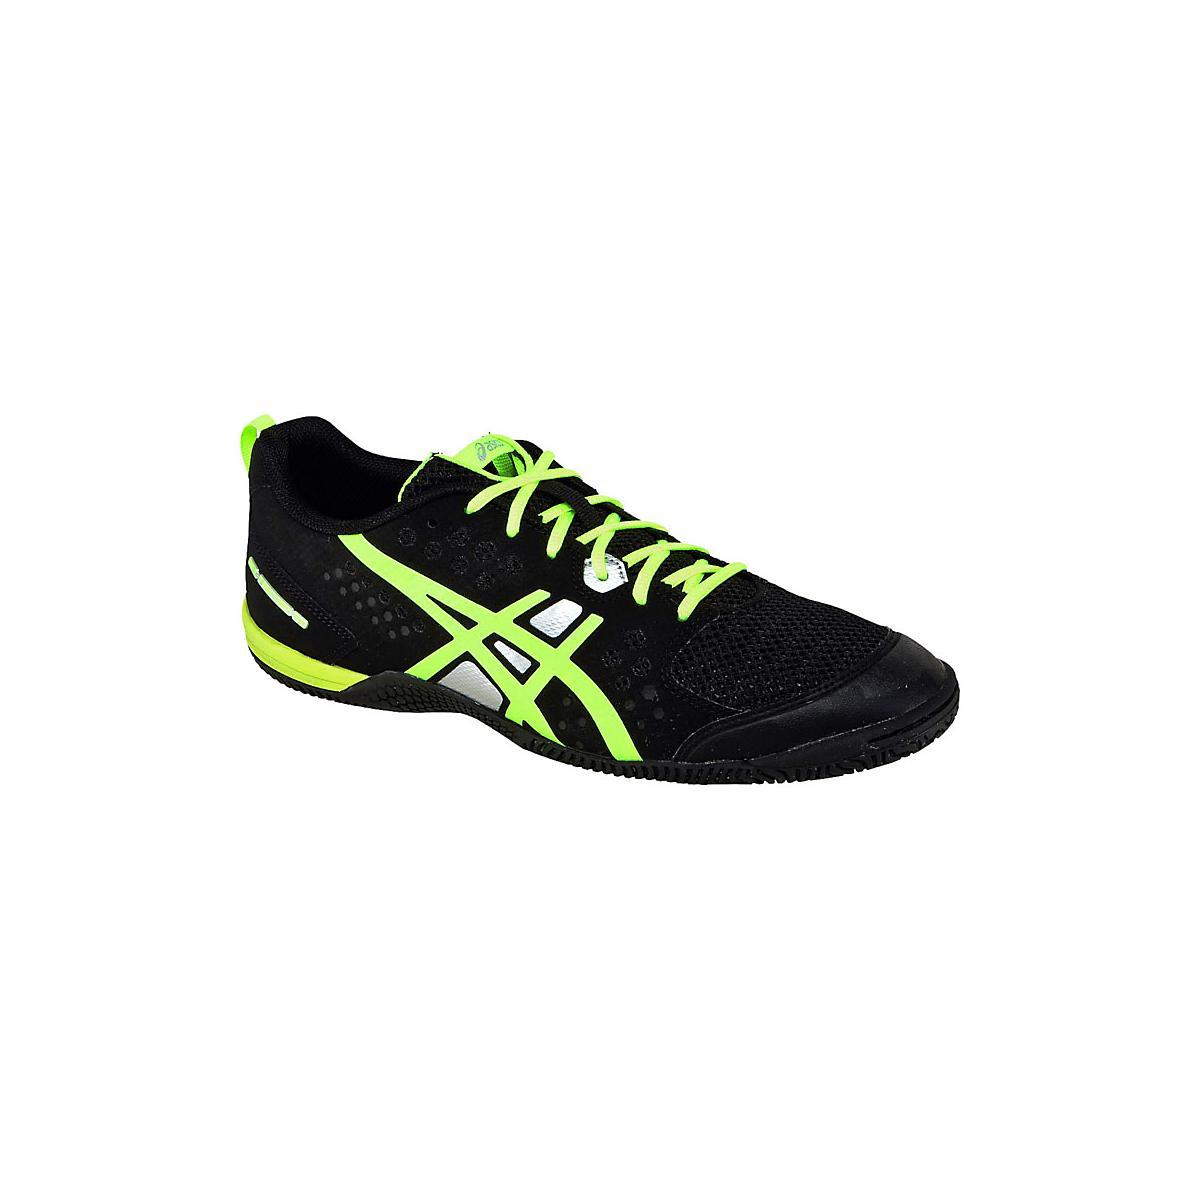 Asics Men S Gel Fortius Tr  Training Shoes